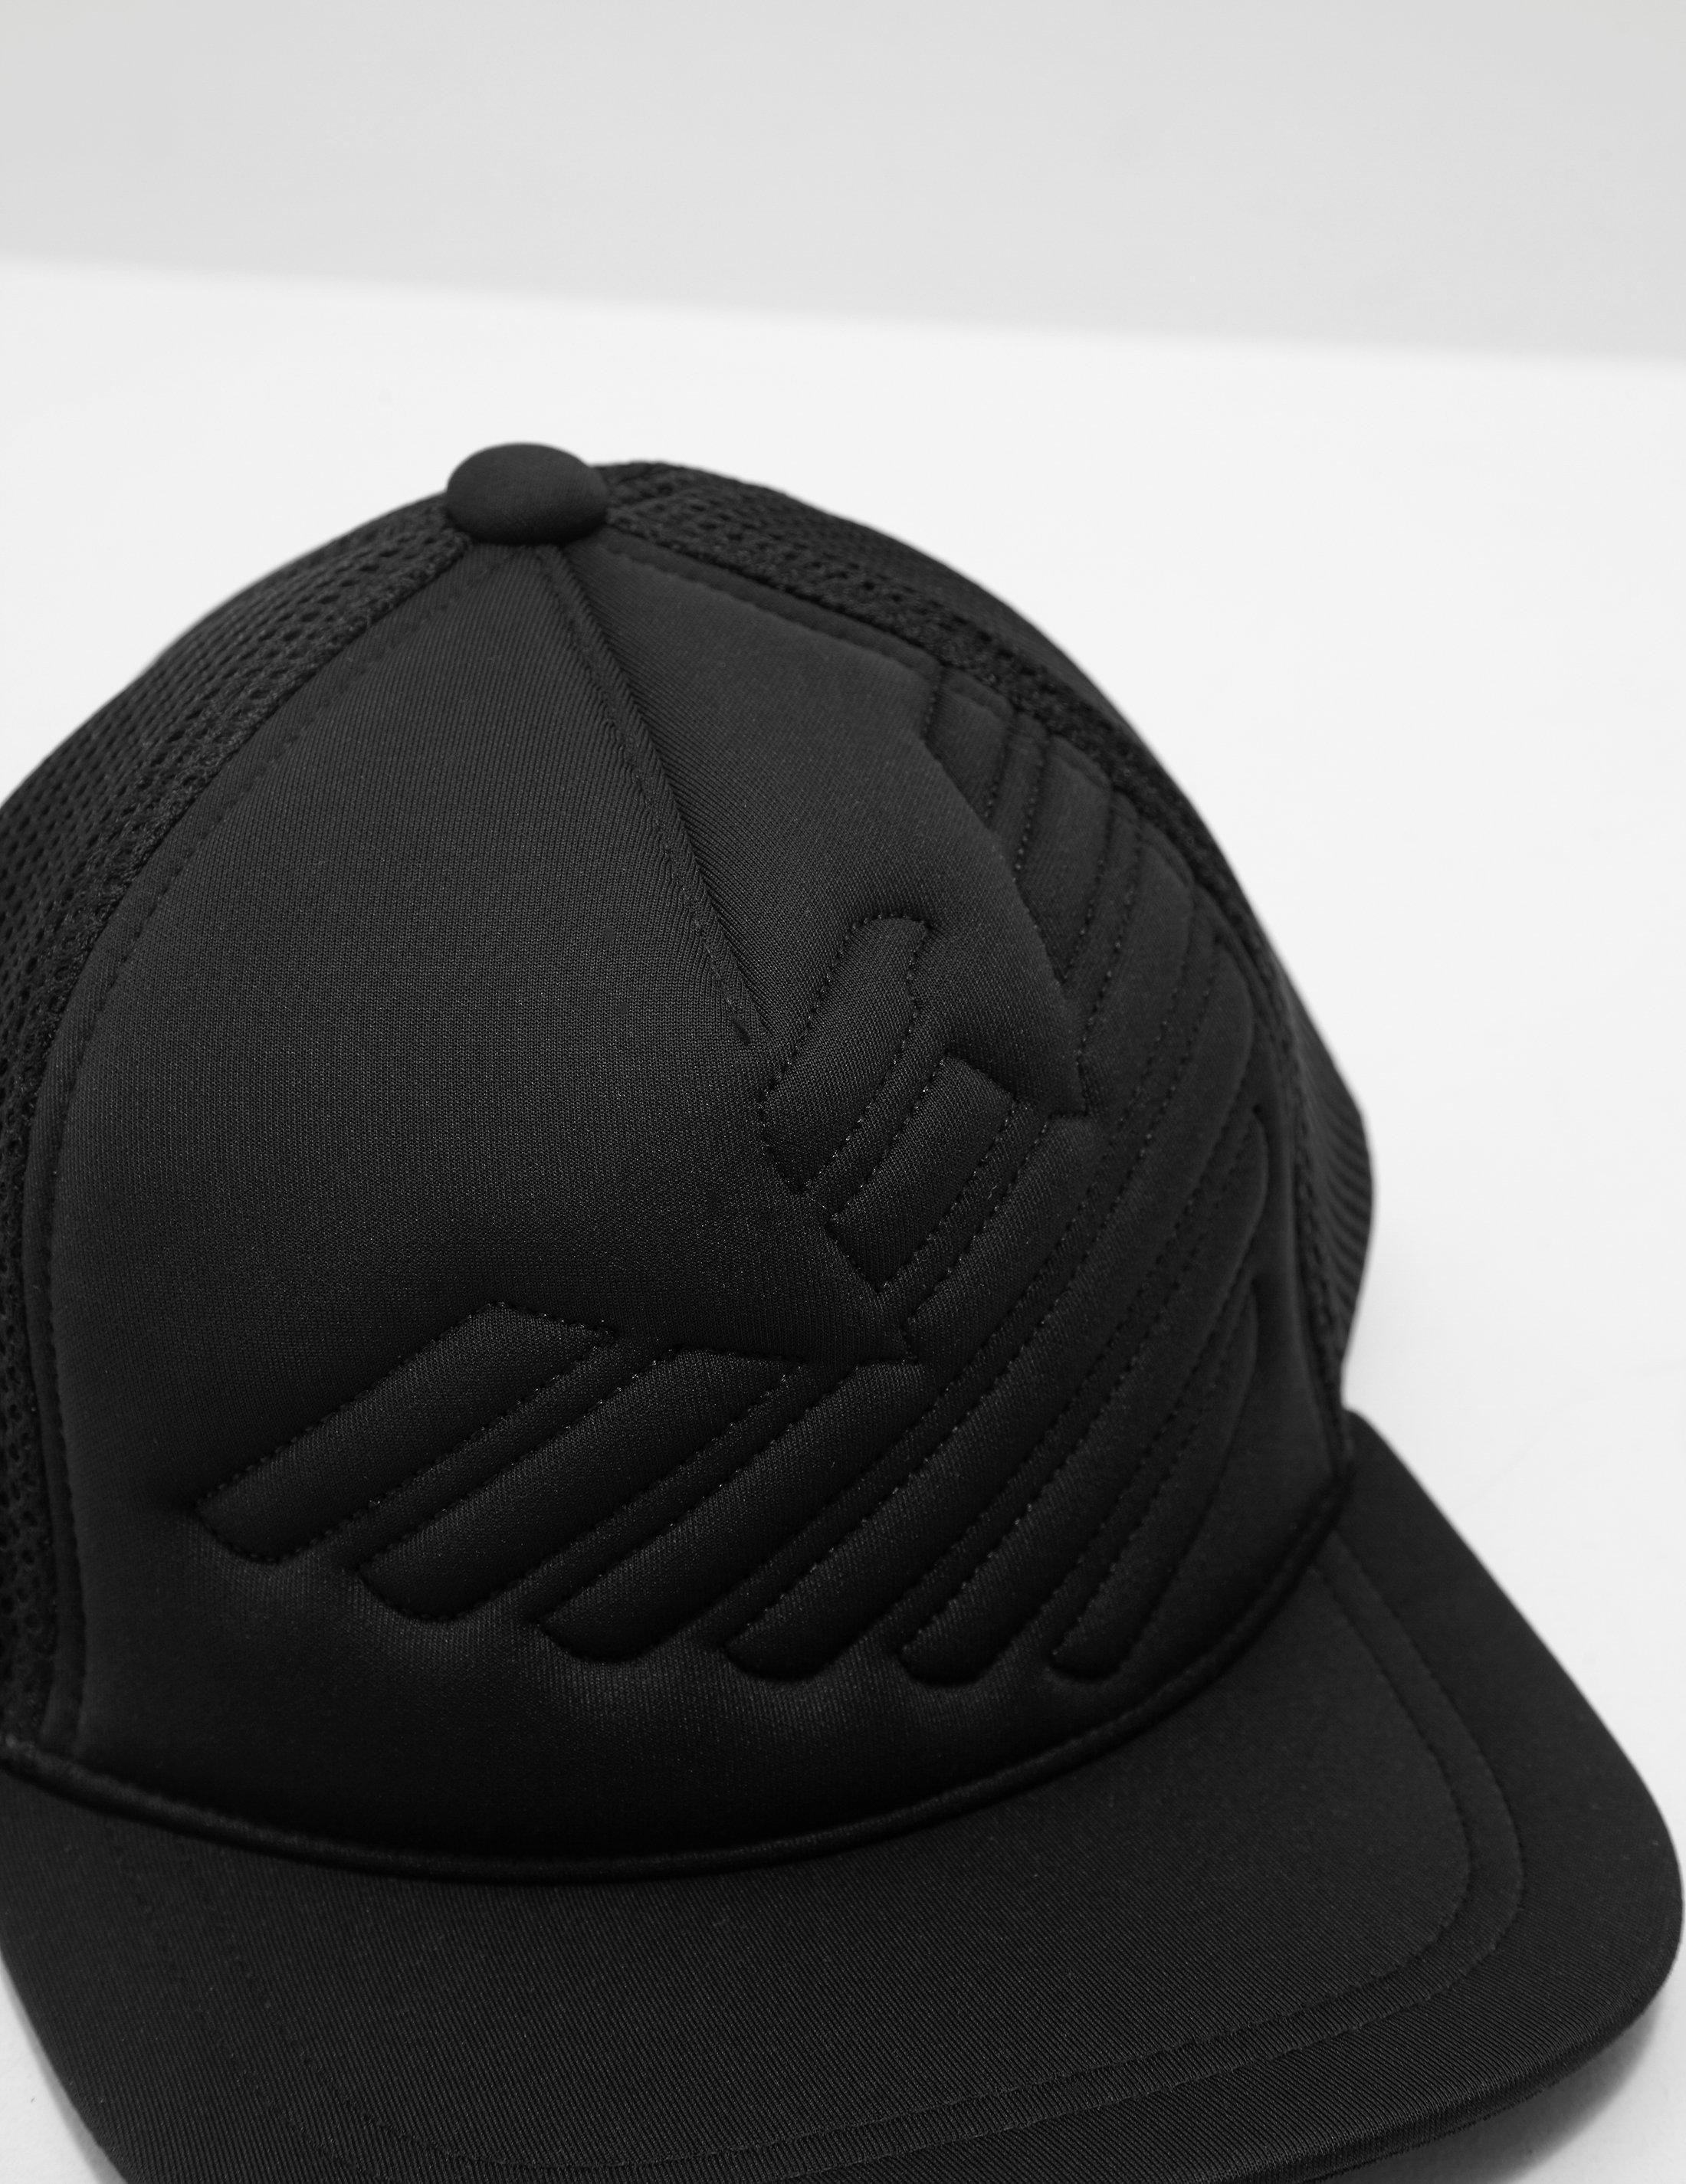 8b57cc8153d Lyst - Emporio Armani Eagle Cap Black in Black for Men